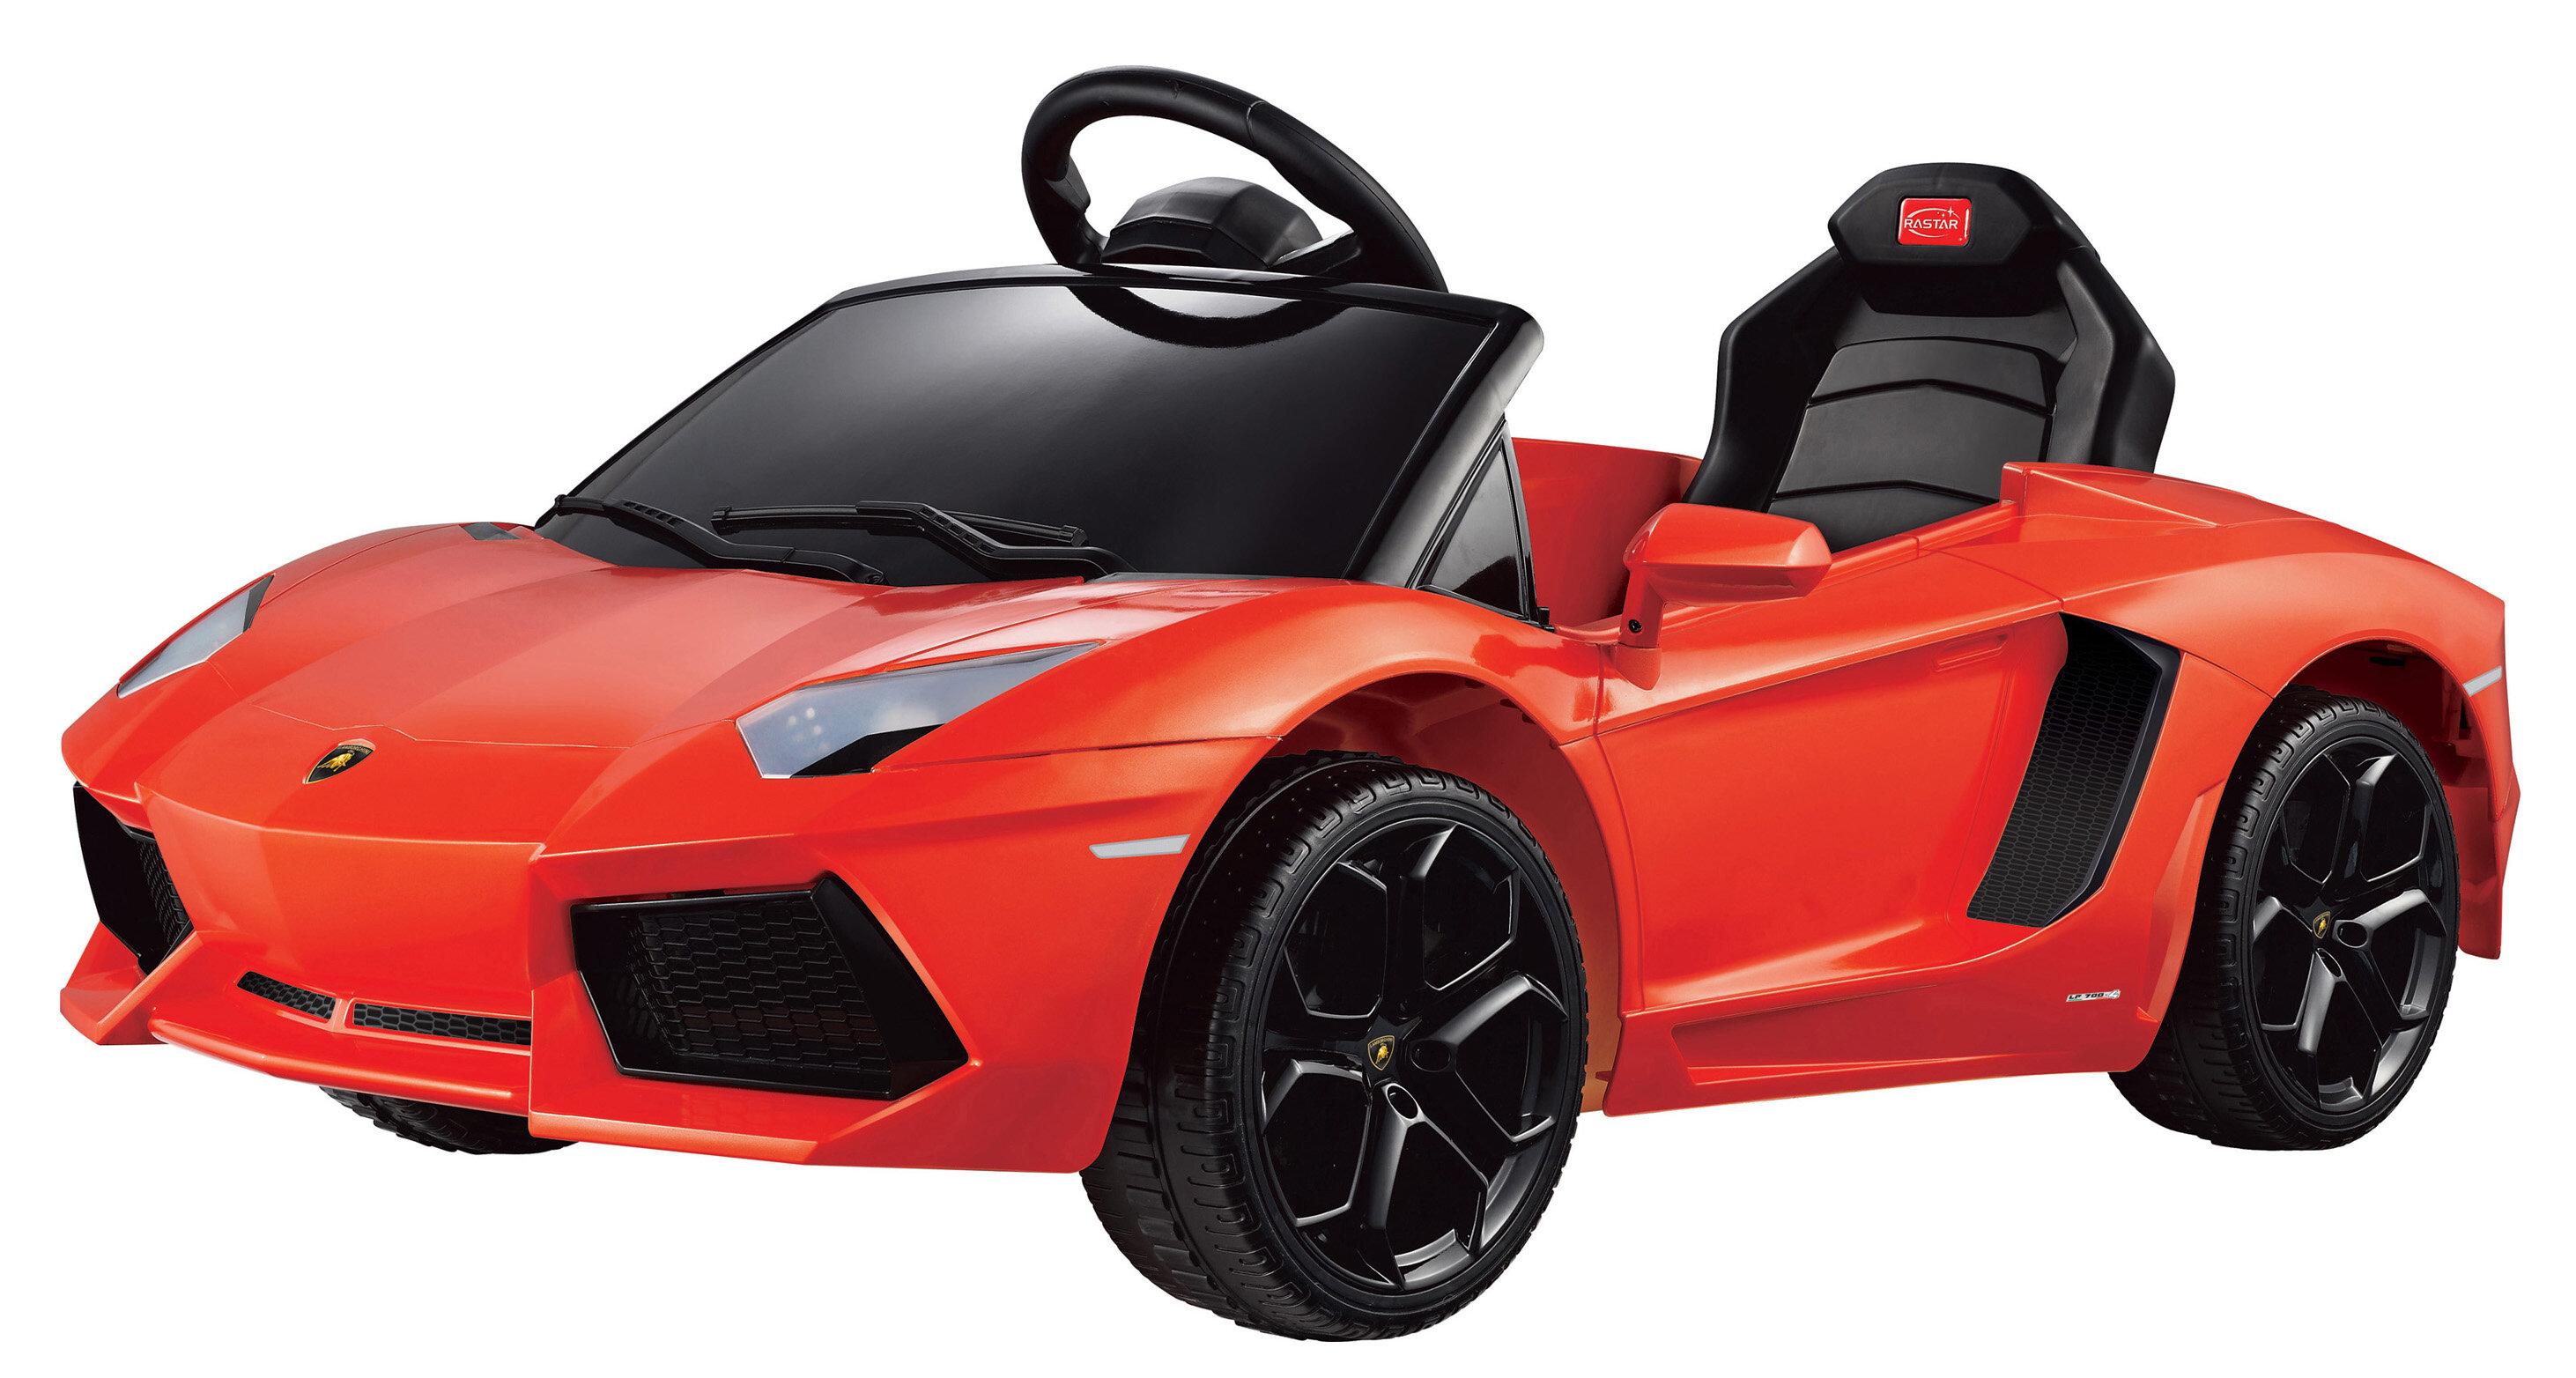 Vroom Rider Lamborghini Aventador Lp700 4 Rastar 6v Battery Powered Gallardo Fuse Box Car Wayfair